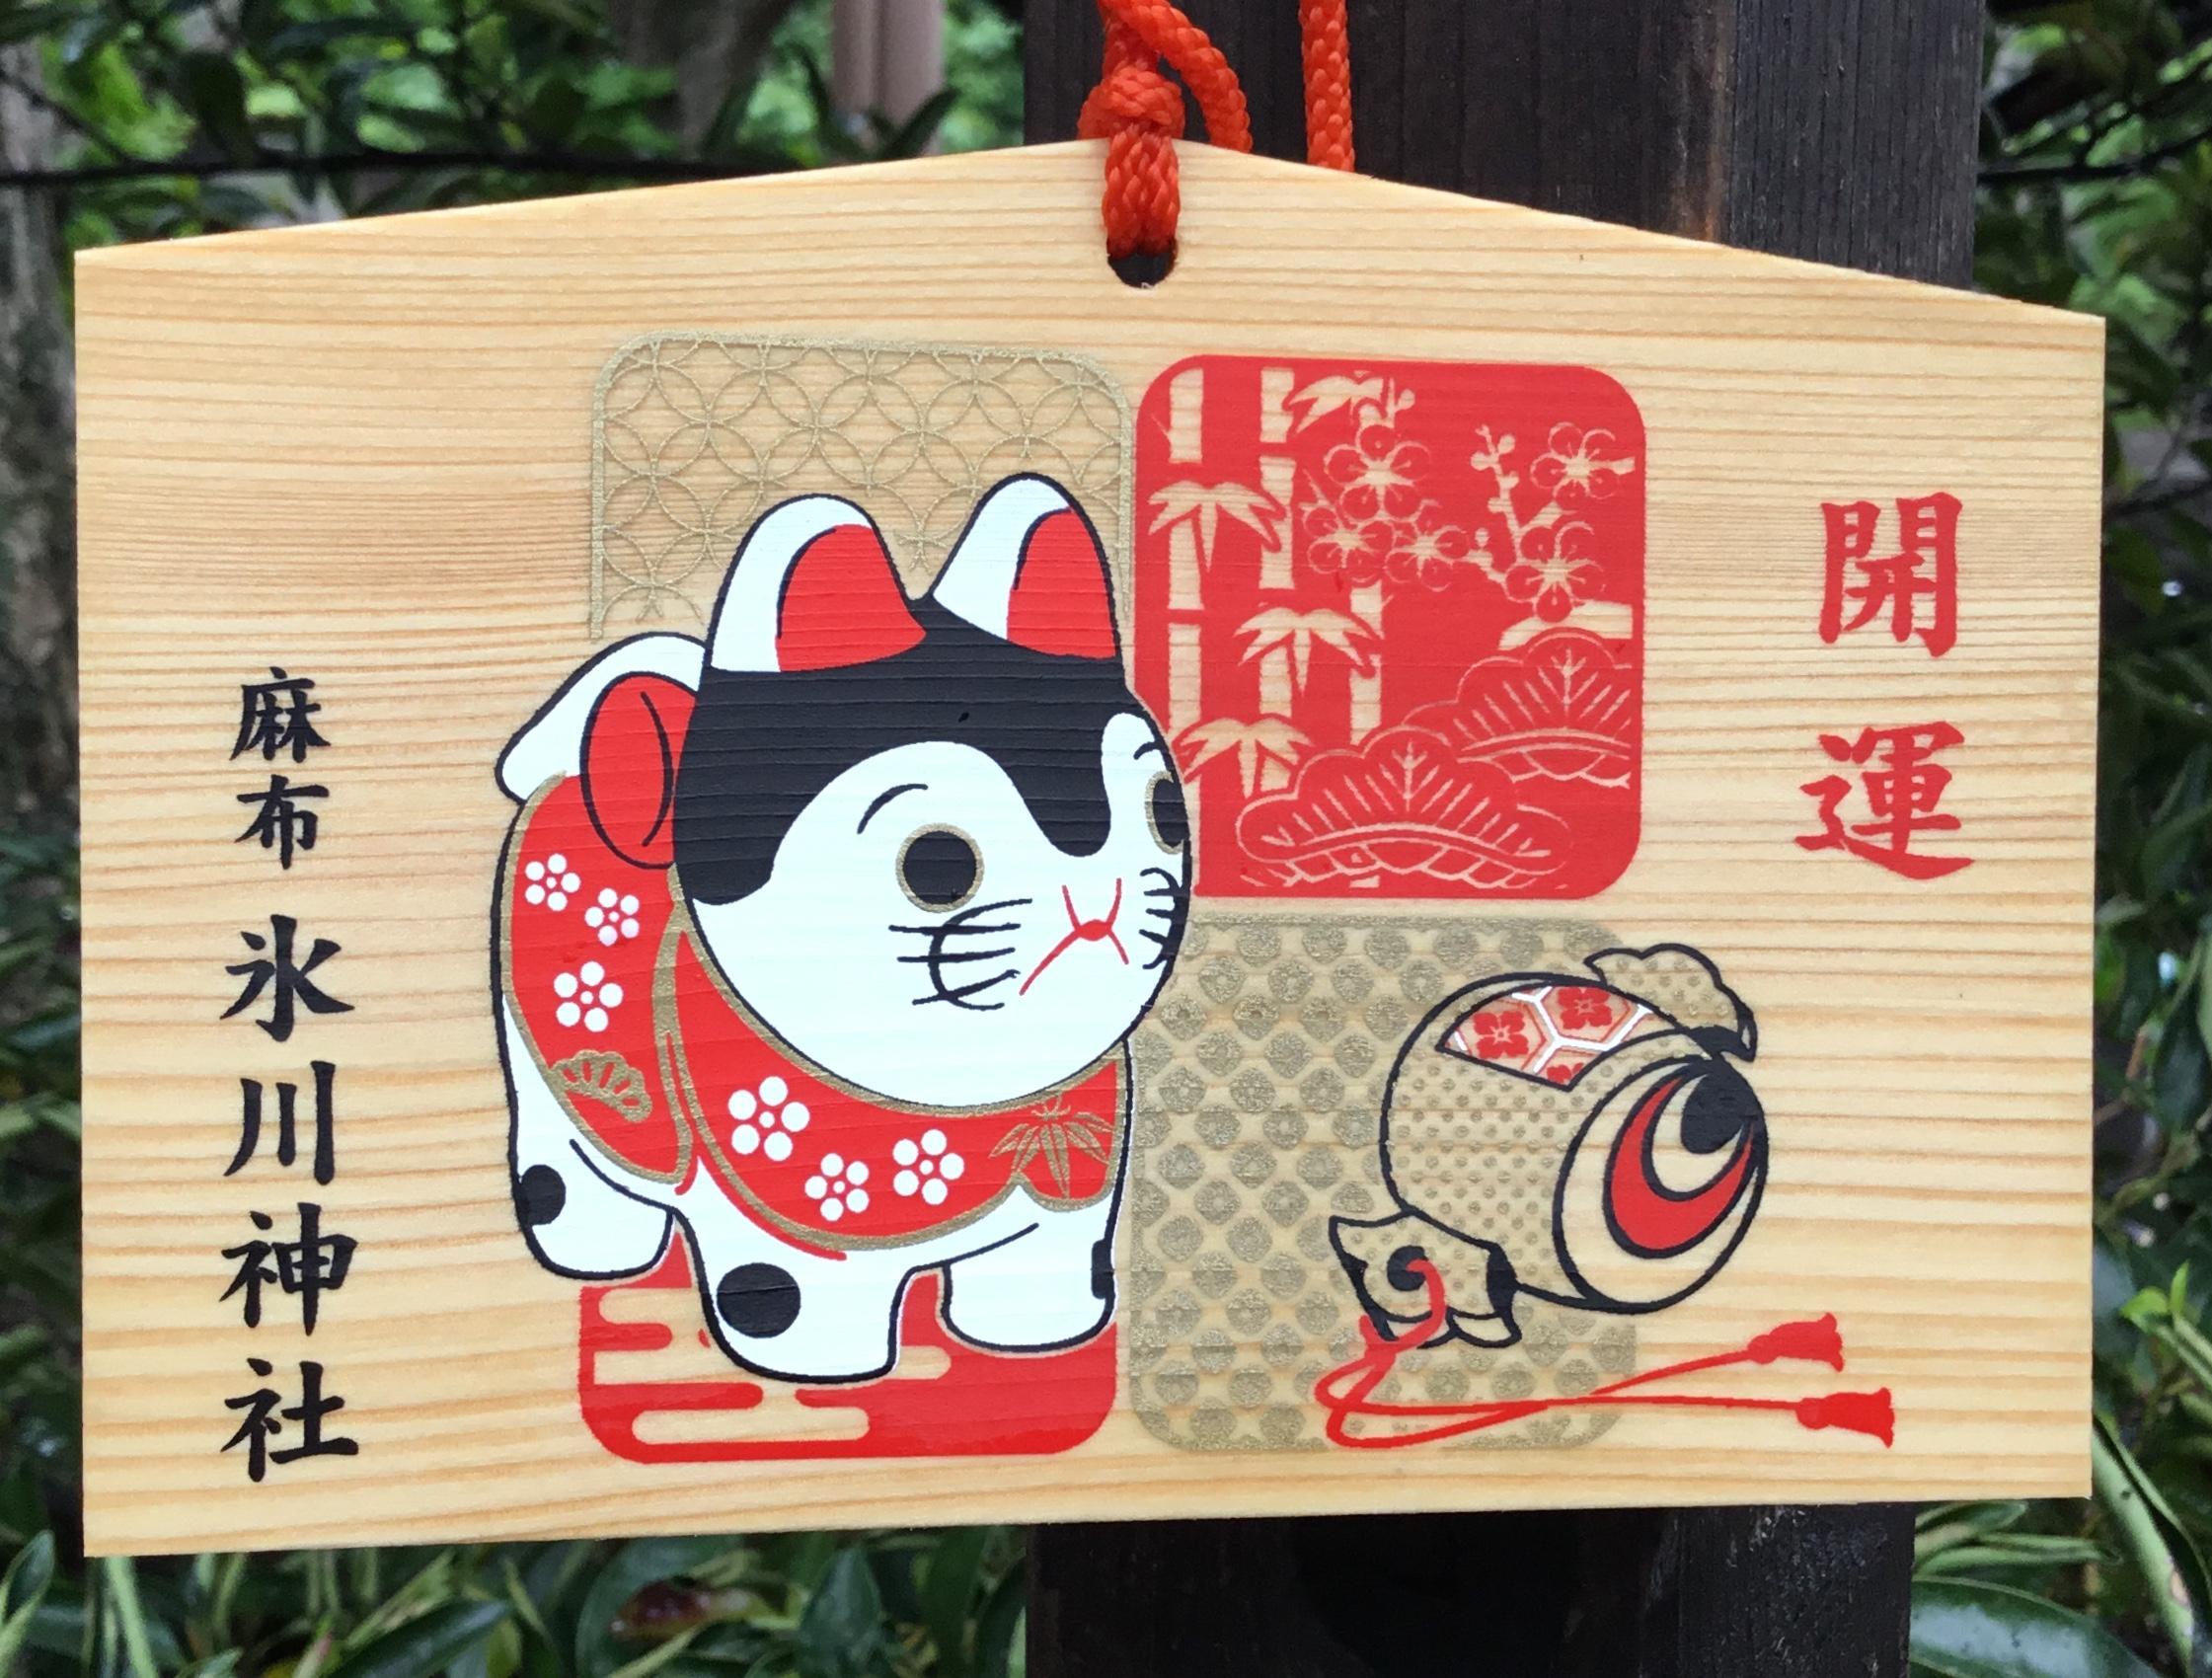 麻布氷川神社の絵馬